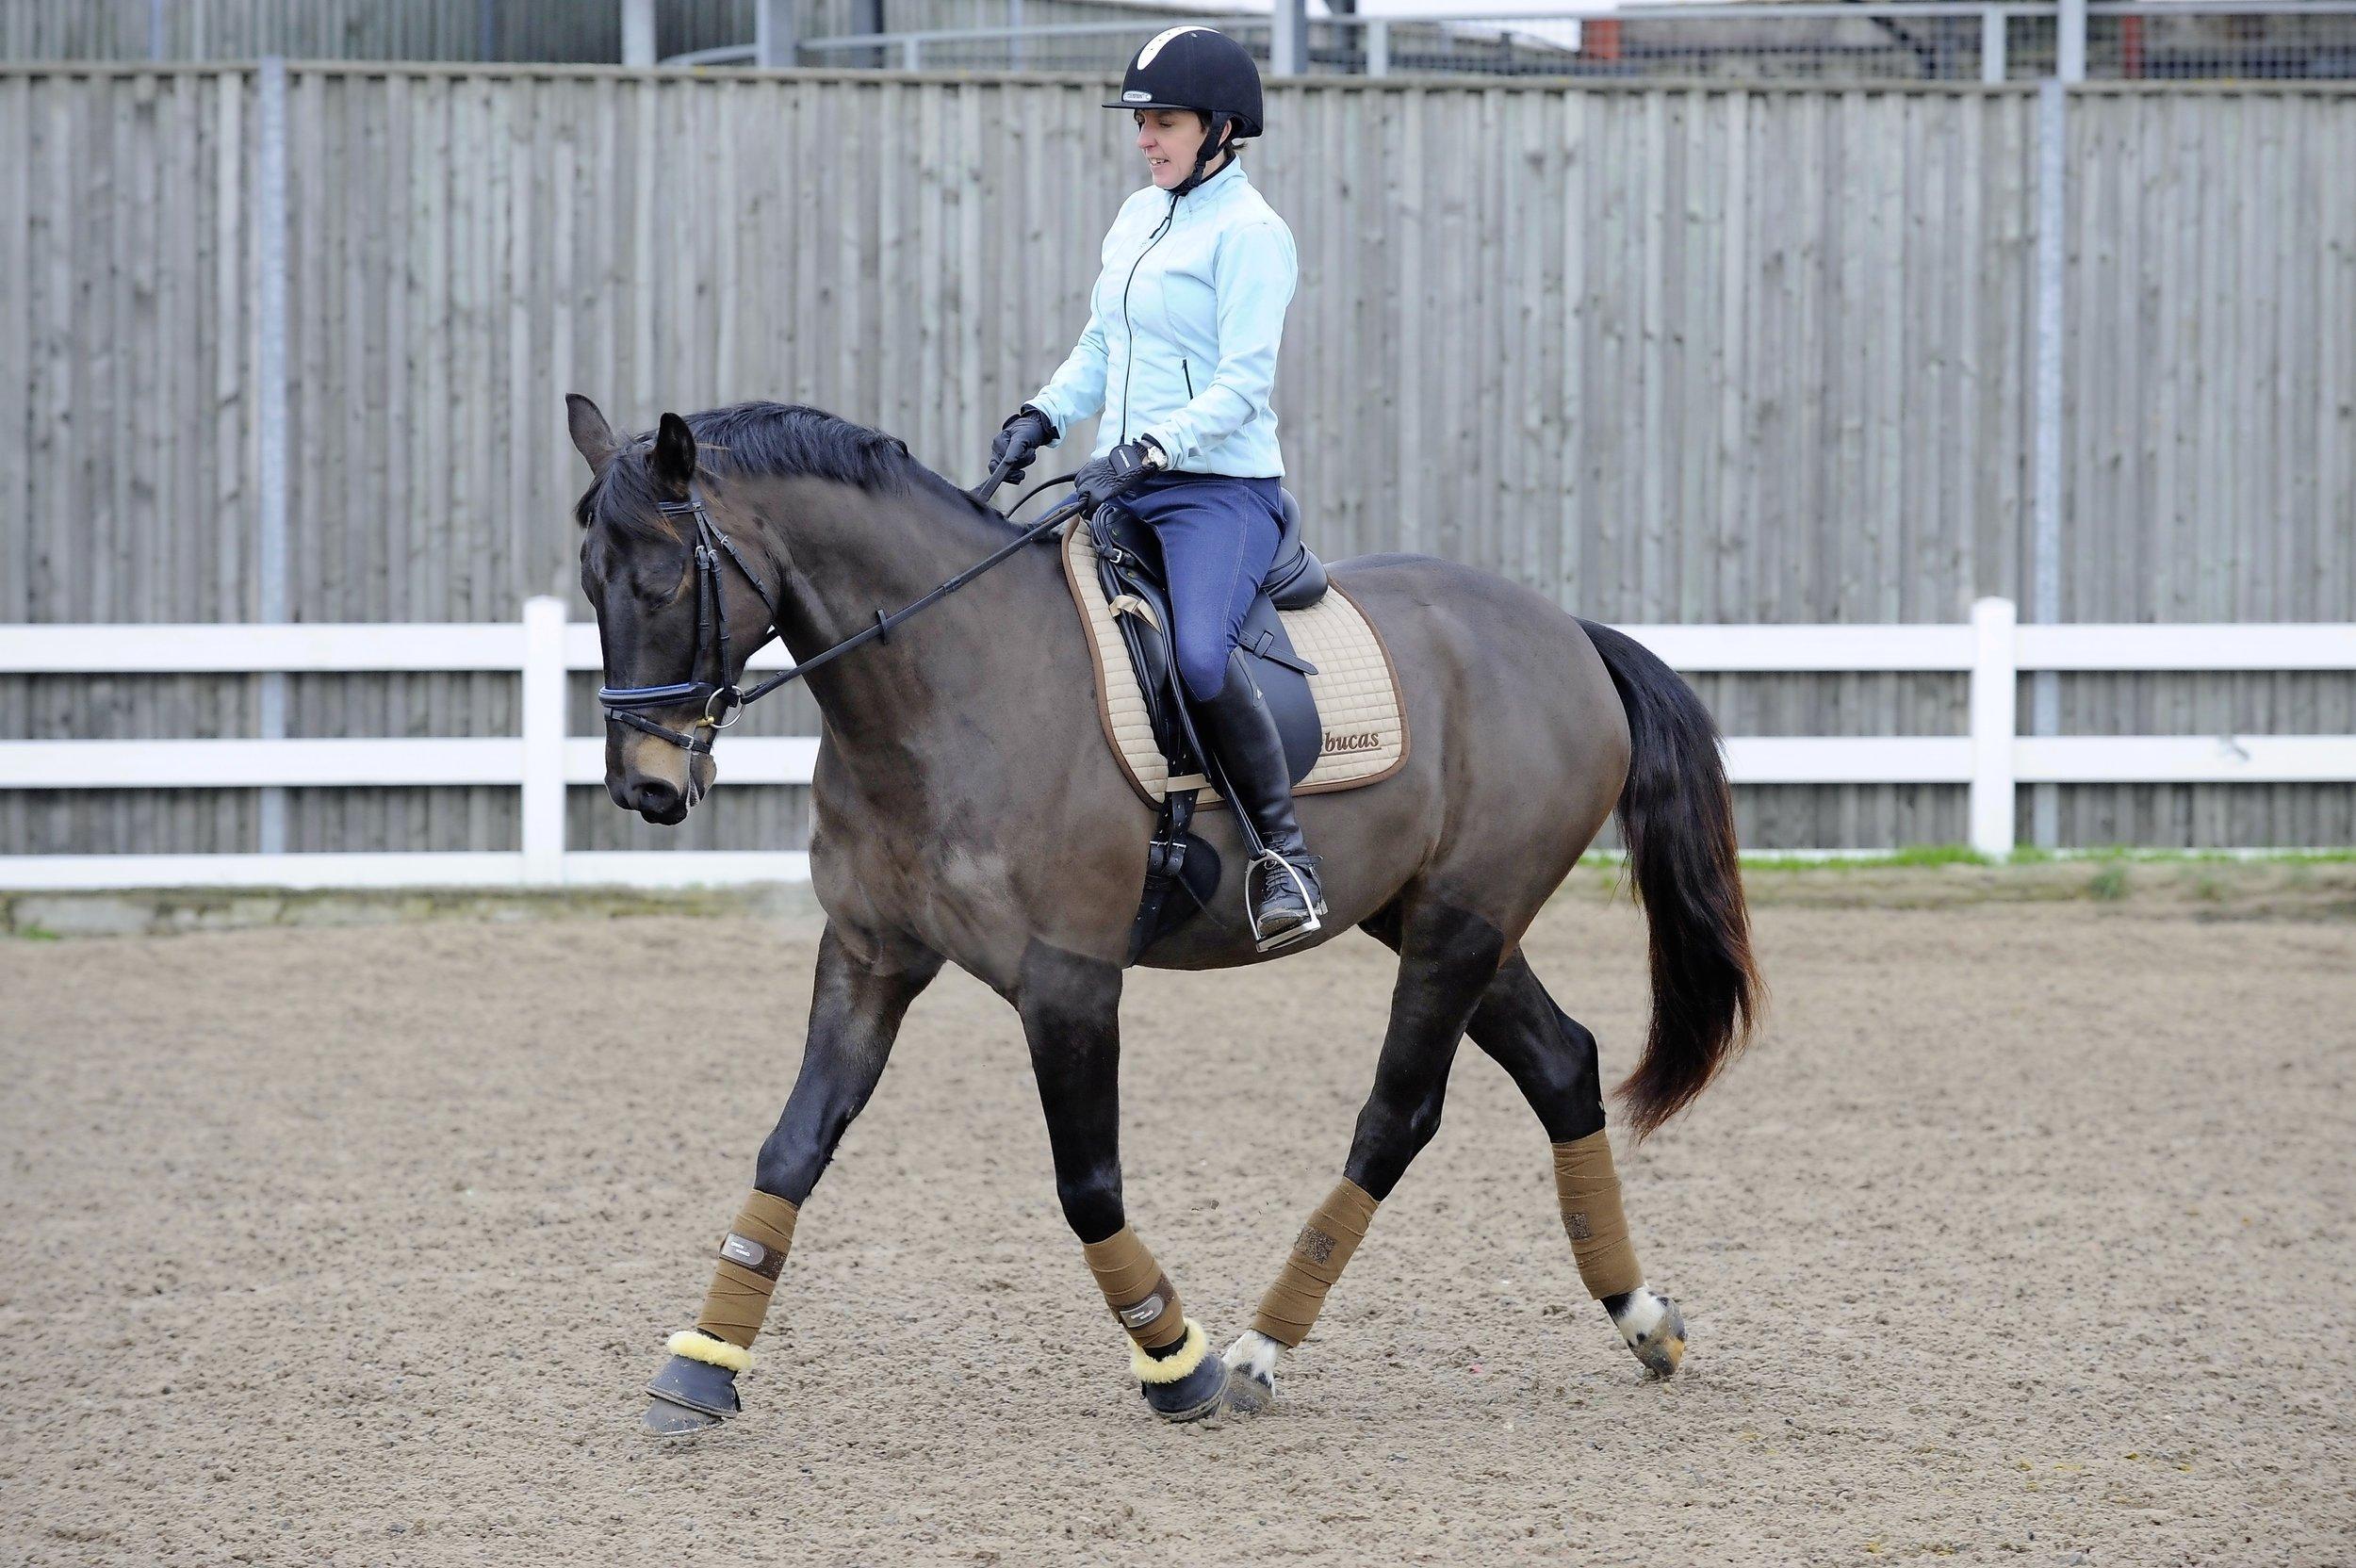 Julie B on horse.jpg